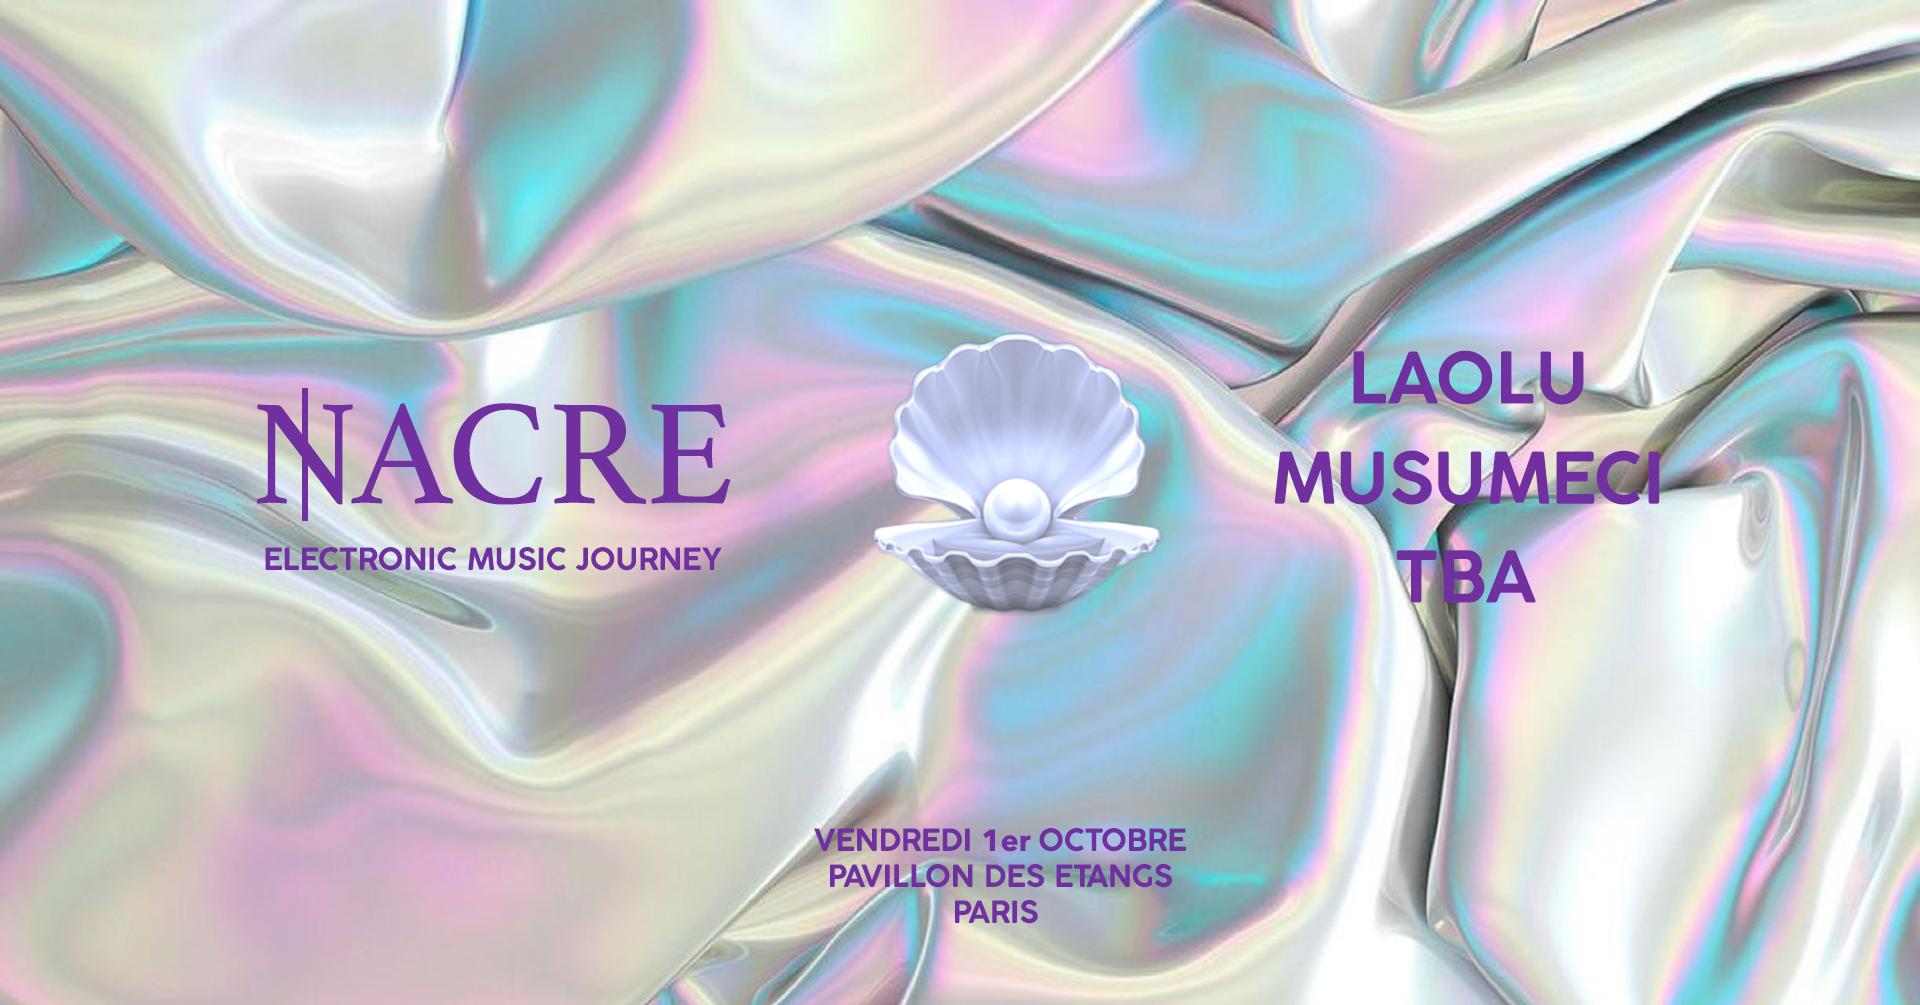 Nacre IV - Musumeci & Laolu